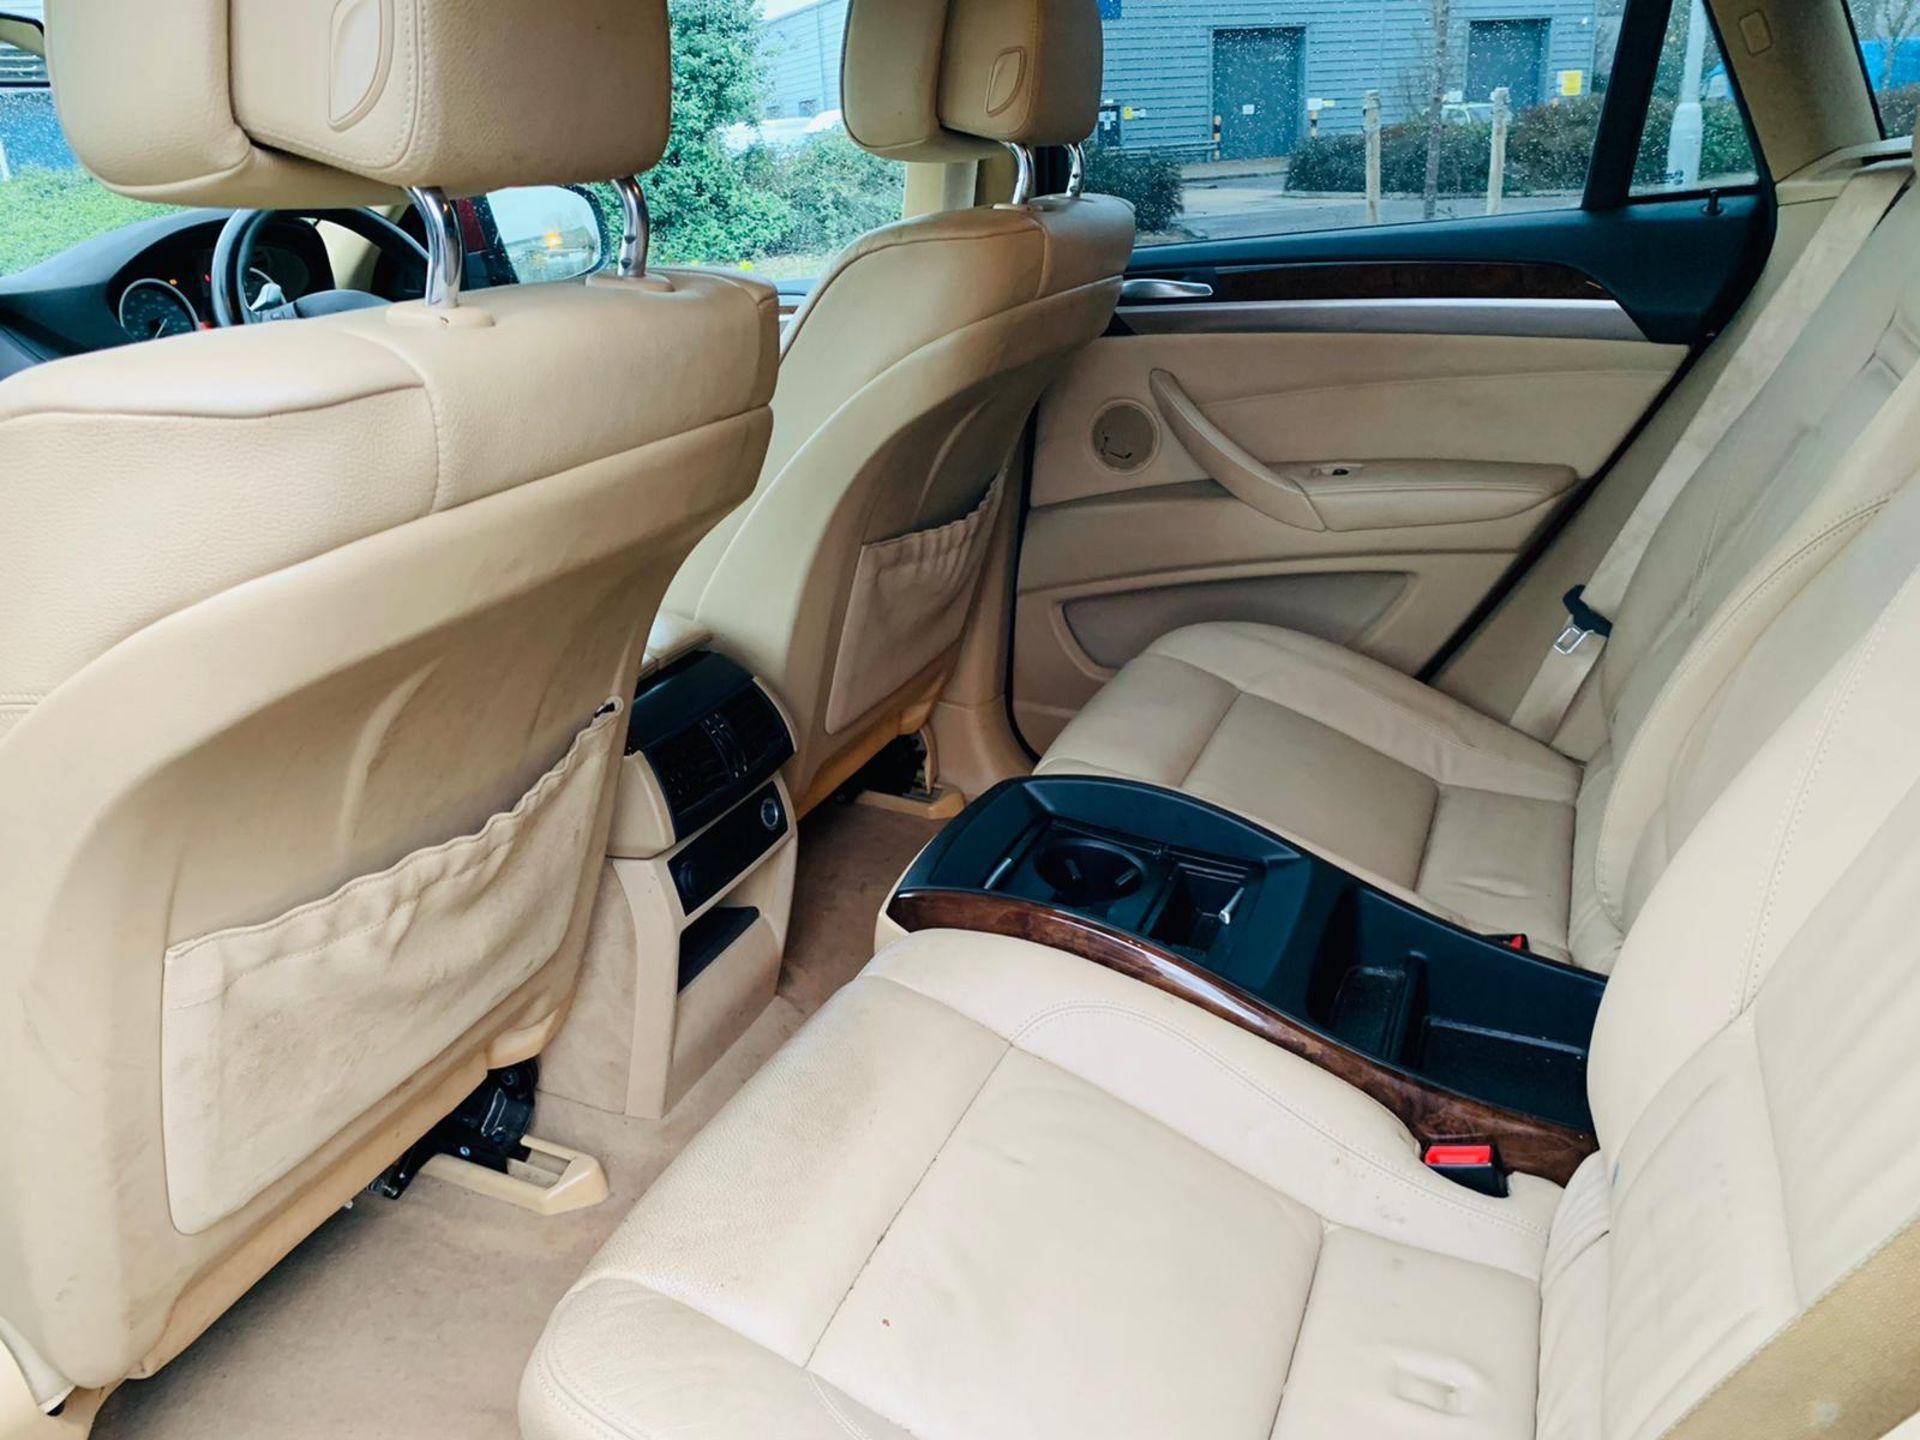 Reseve Met - BMW X6 xDrive 3.0d Auto - 2014 Reg - Leather Interior -Parking Sensors - Reversing Cam - Image 18 of 30